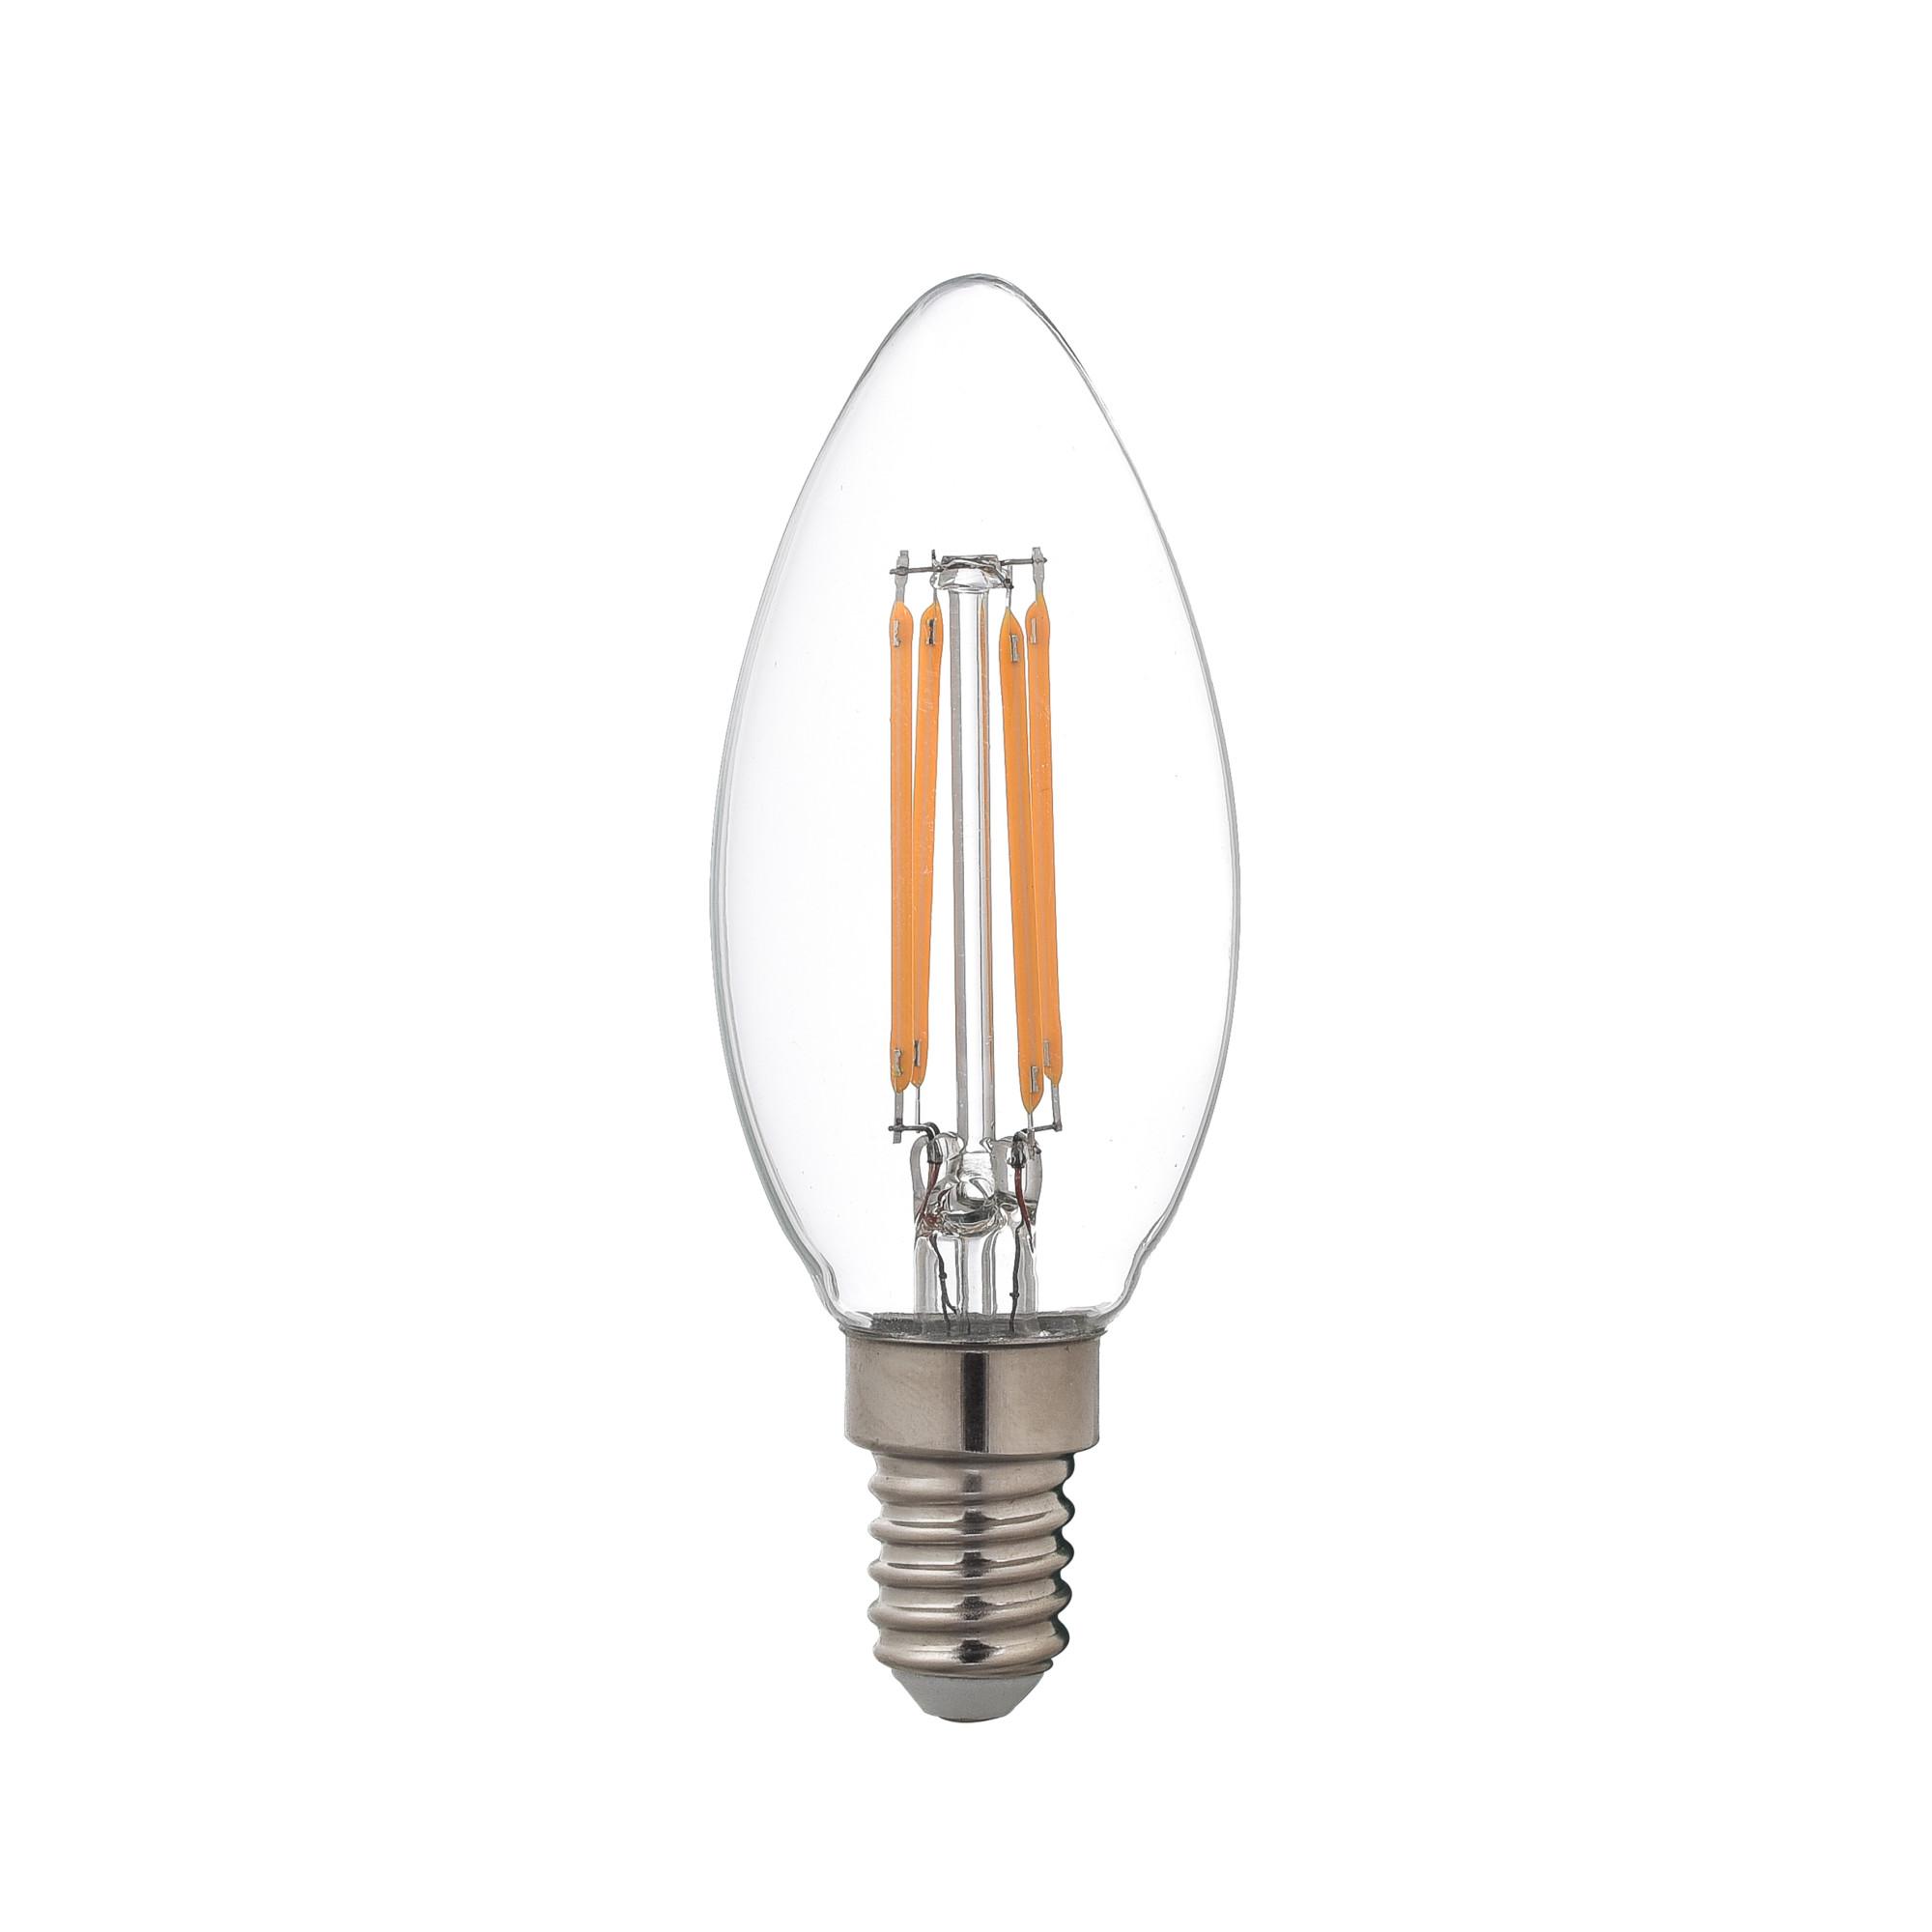 Лампа светодиодная Lexman E14 45 Вт 470 Лм 2700 K свет тёплый белый